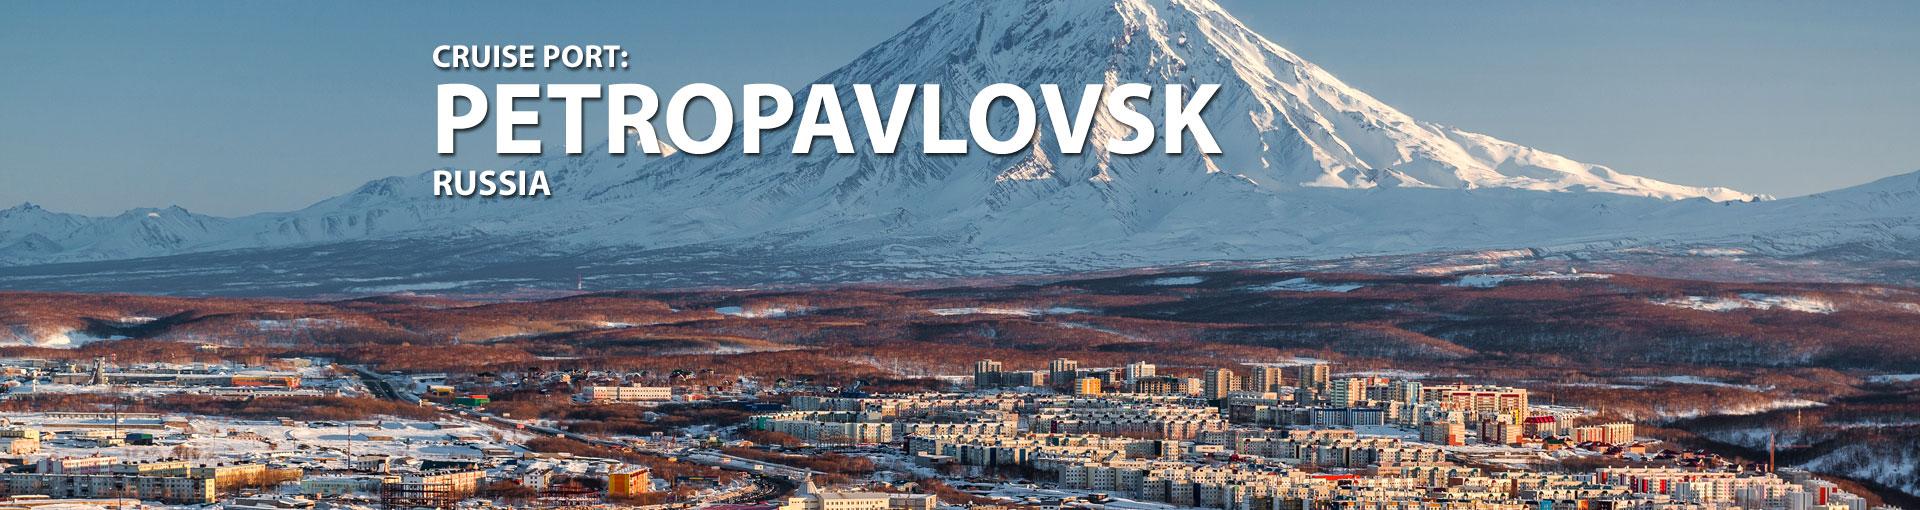 Cruises to Petropavlovsk, Russia